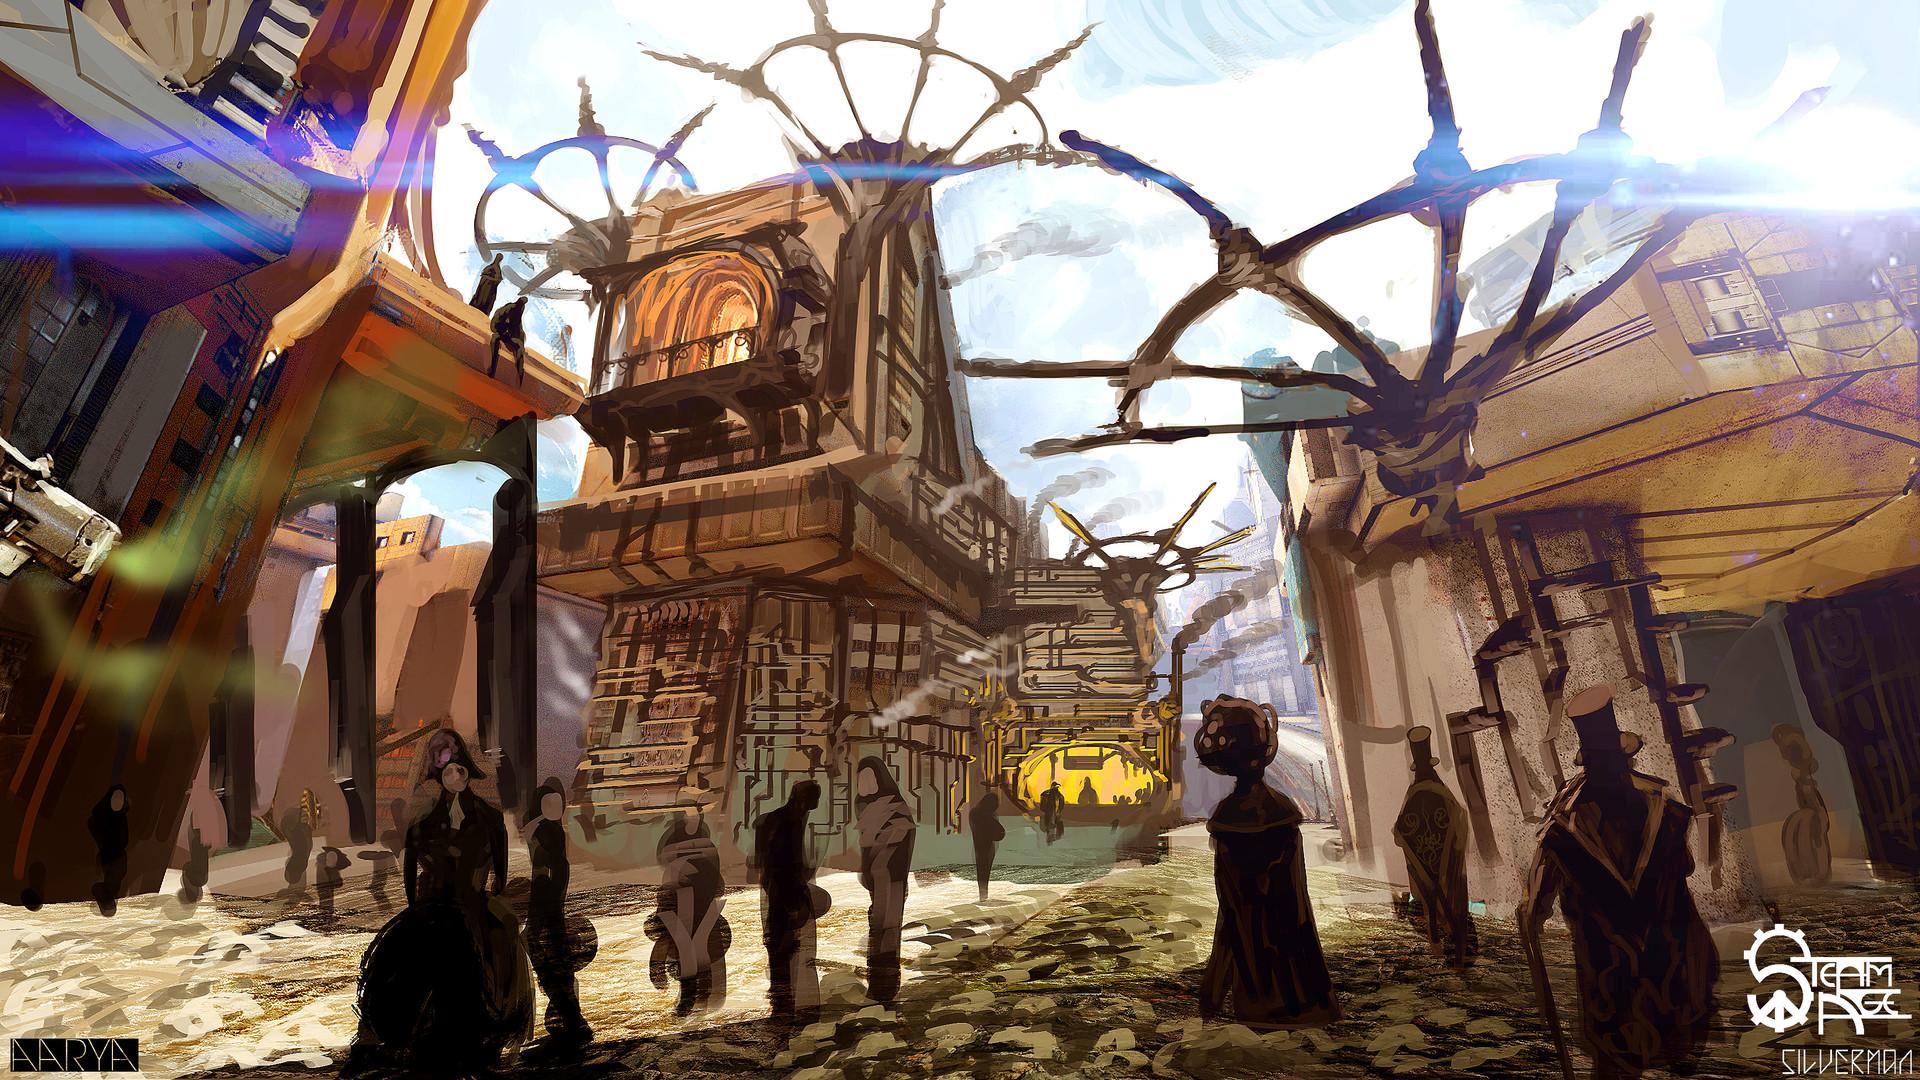 Samuel silverman aarya street concept 2